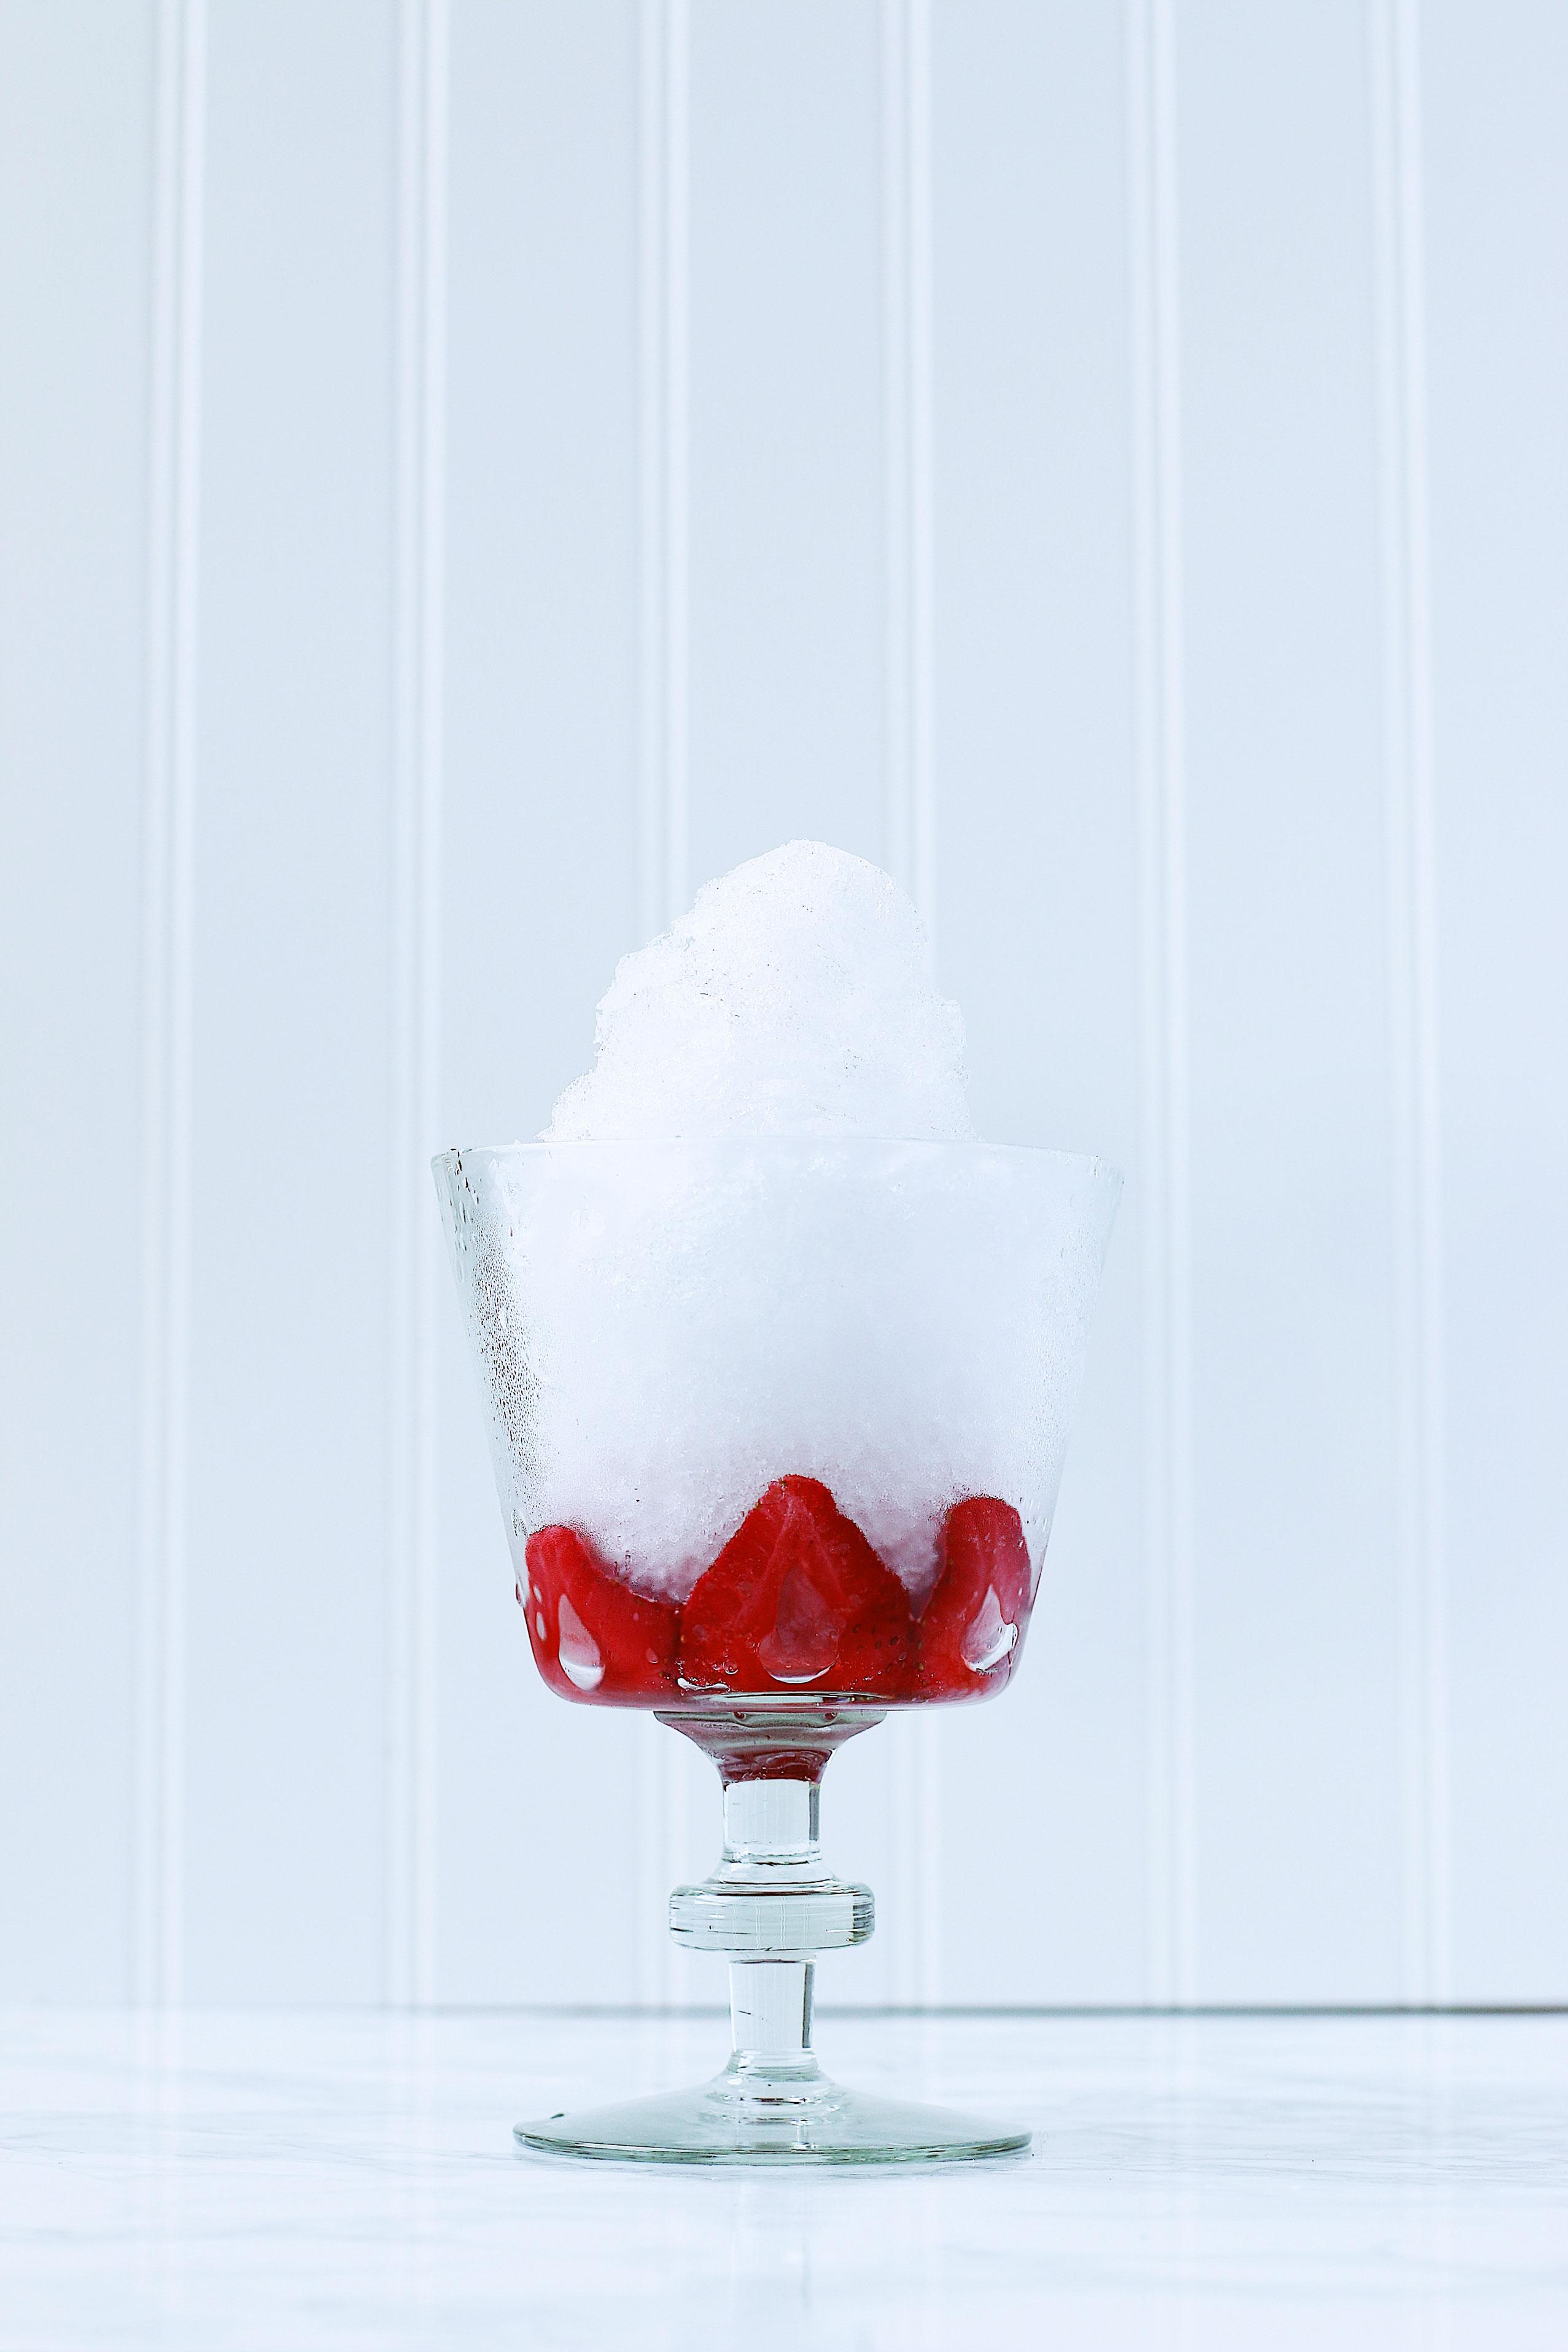 herbakinglab-strawberry-shaved-ice-plain